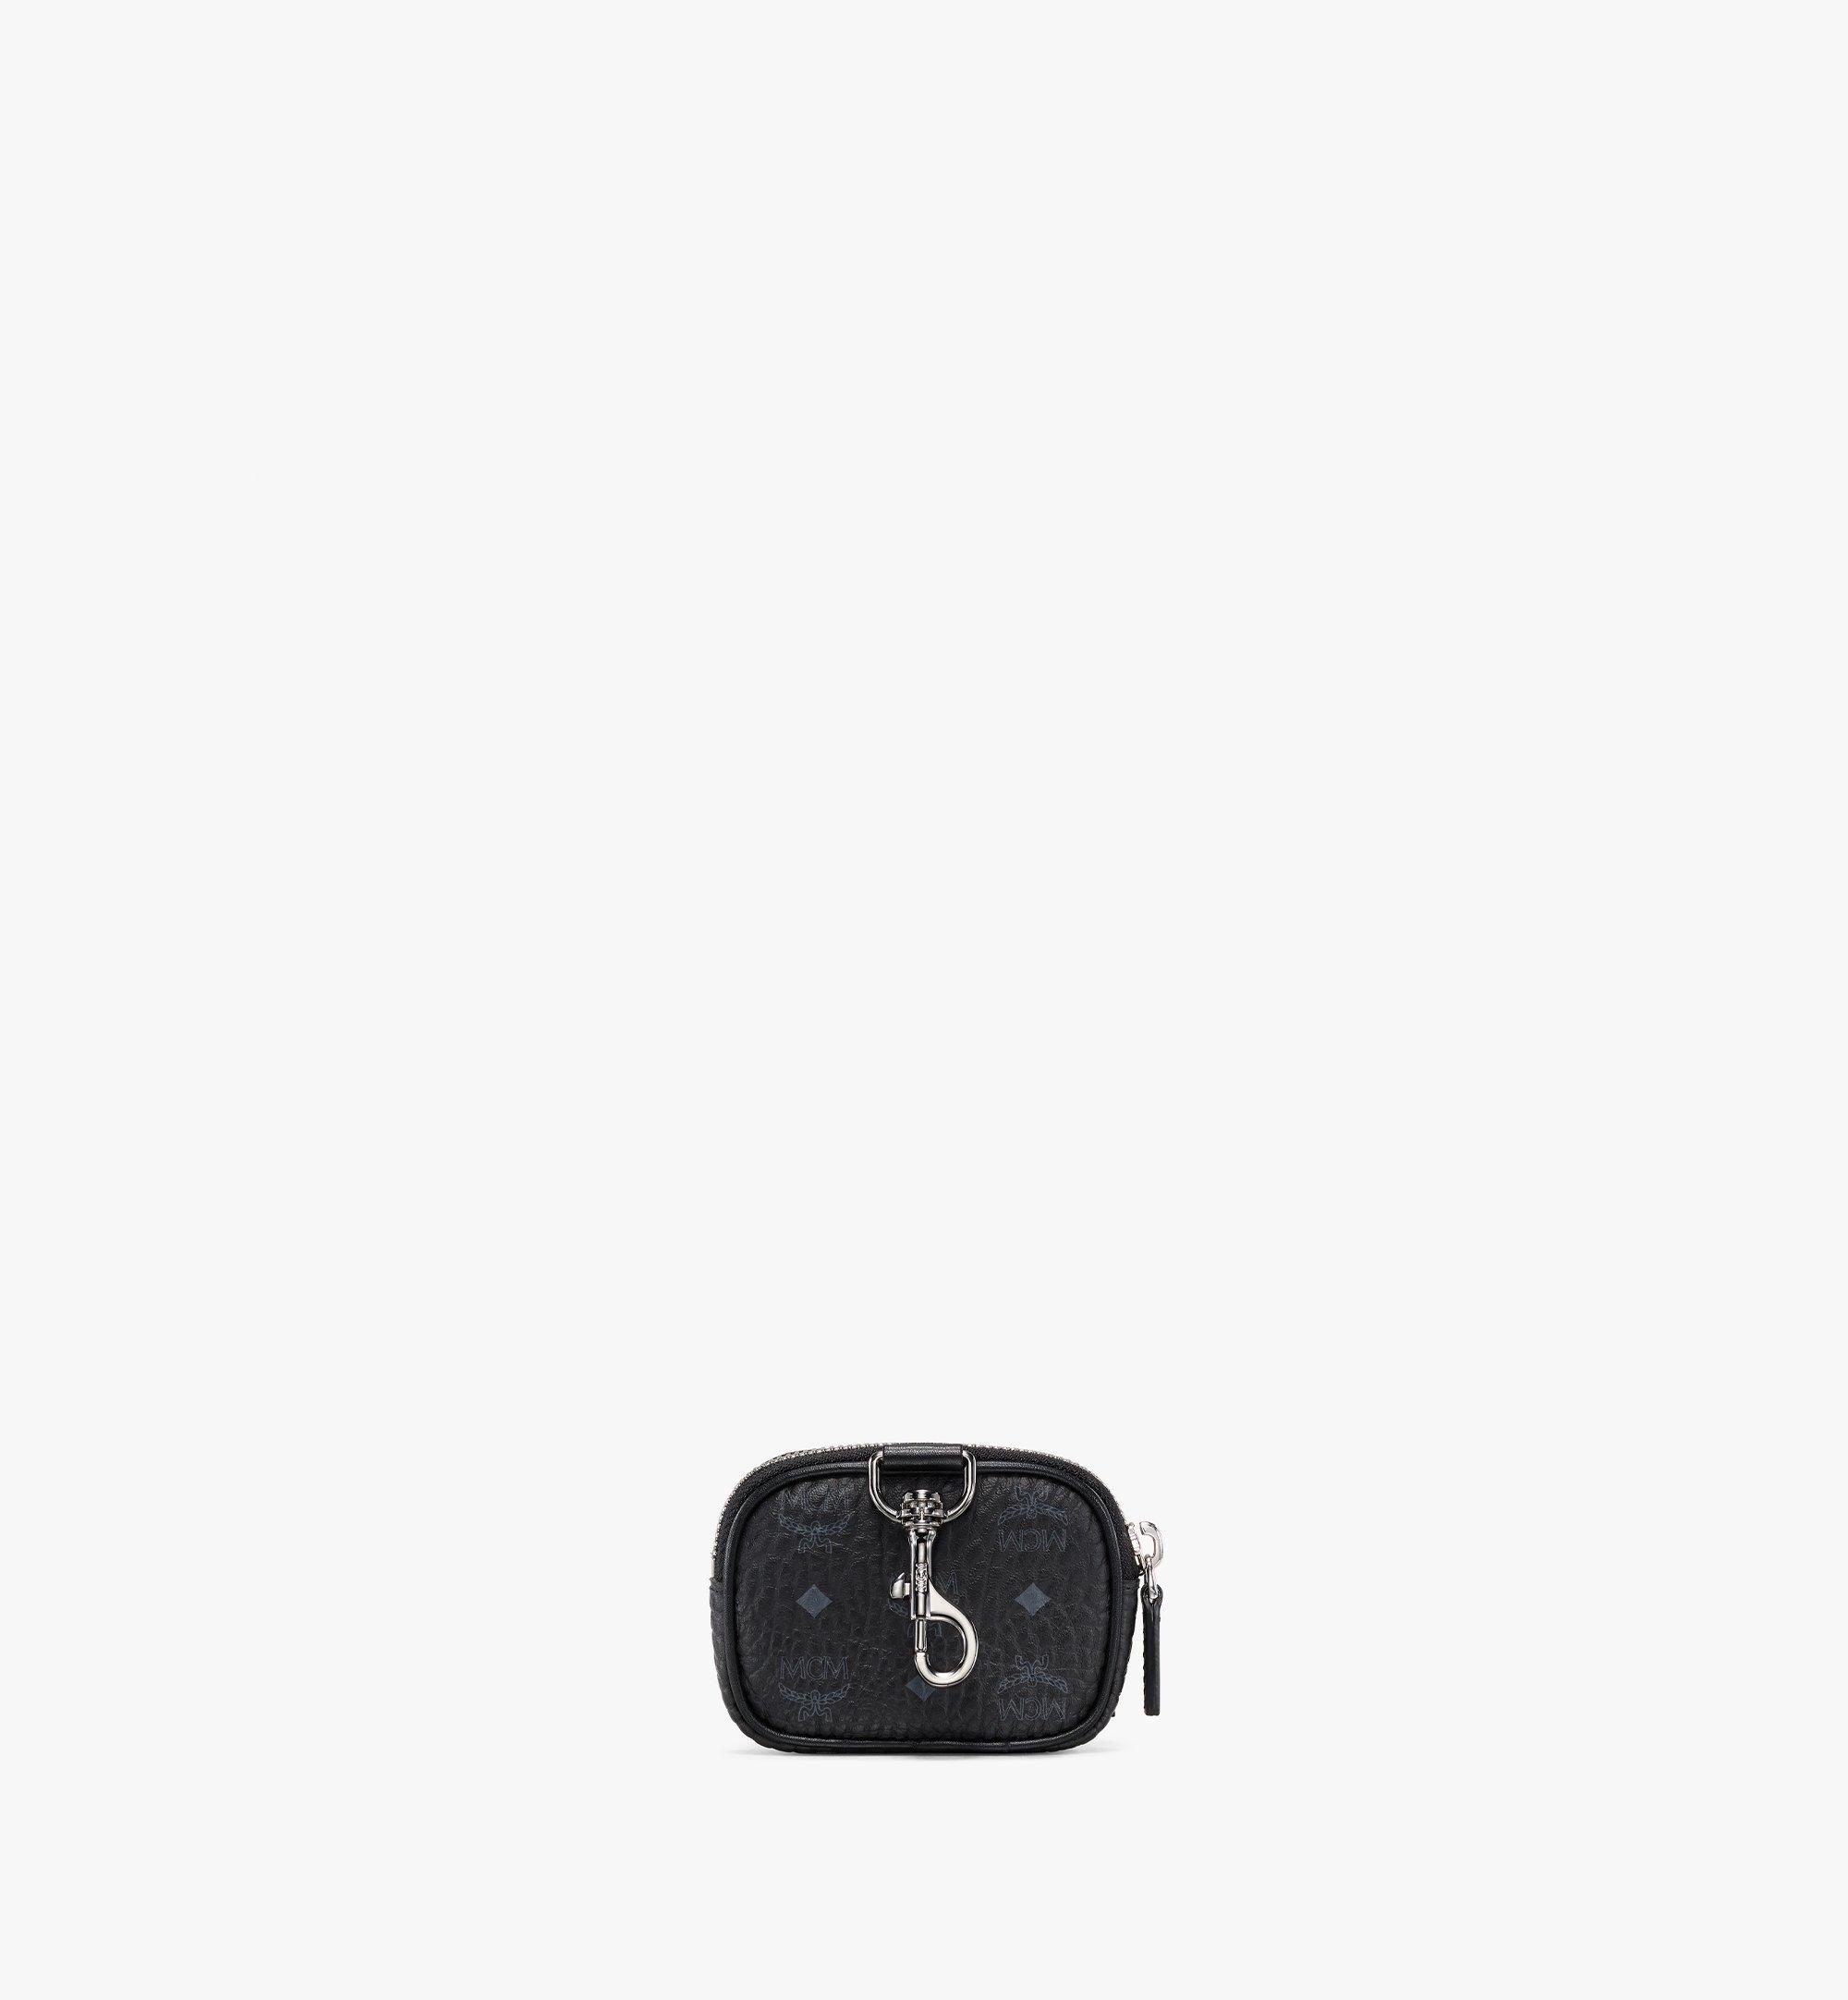 MCM E/W Pouch Charm w/ Pocket in Visetos Original Black MXZBSVI08BK001 Alternate View 3